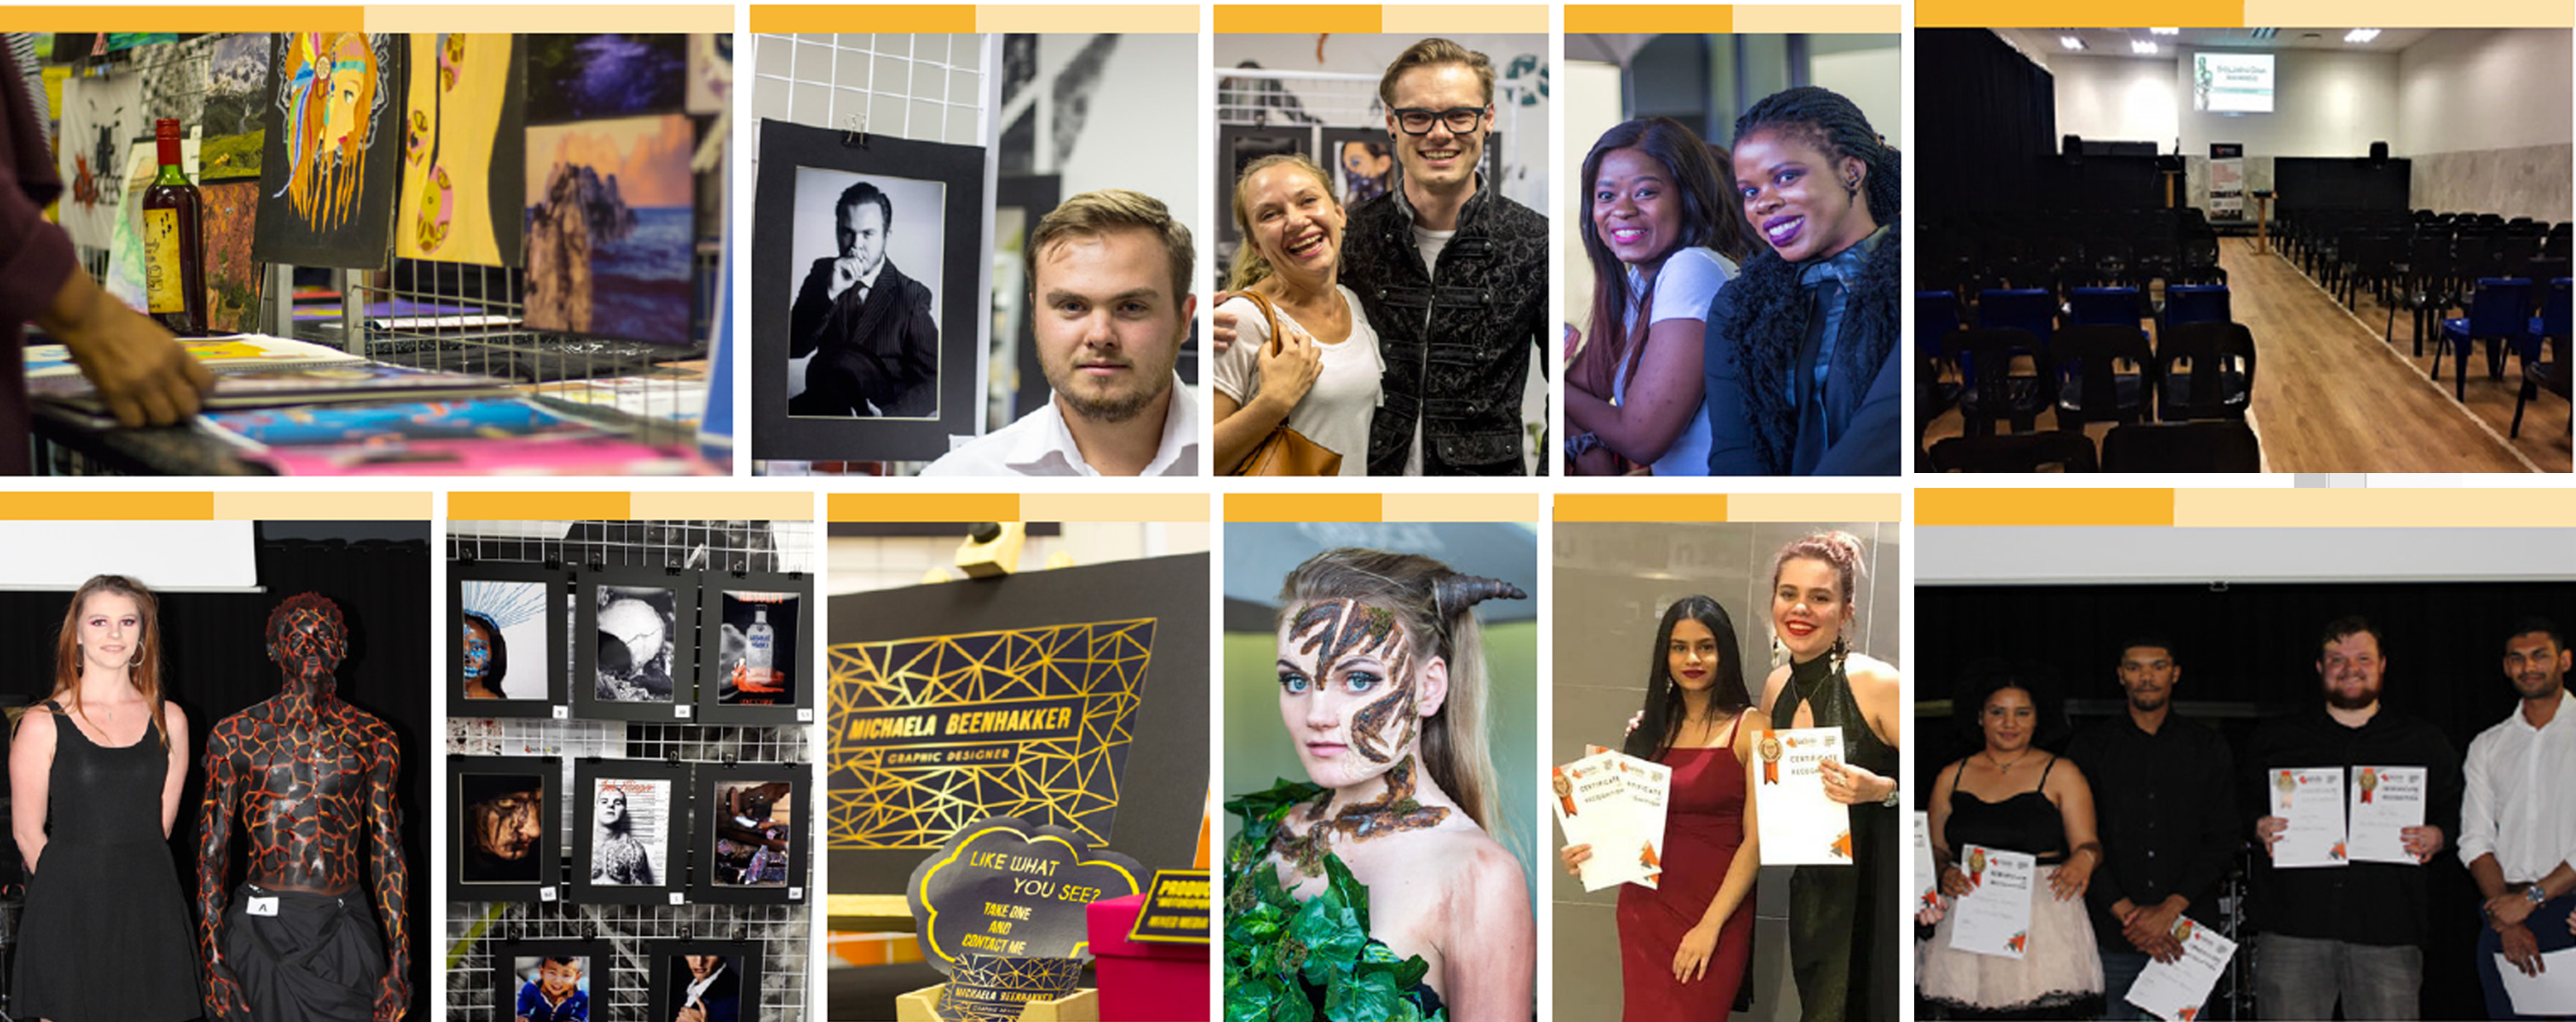 Golden Oak Awards collection of images